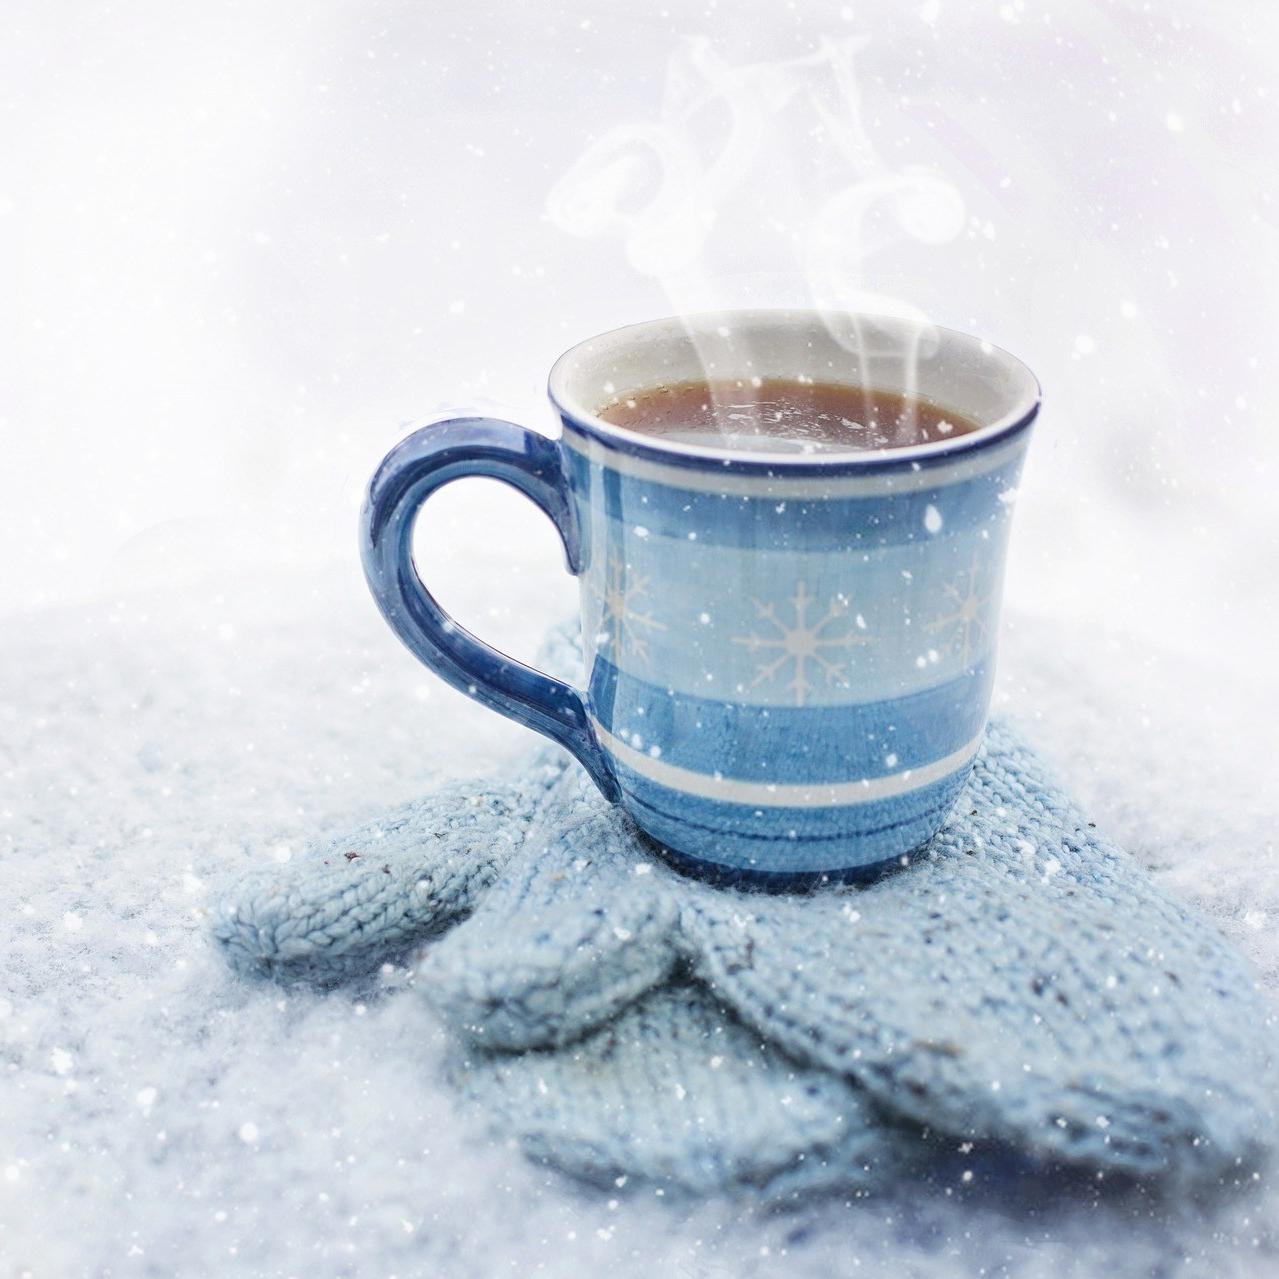 coffee-1156595_1920.jpg